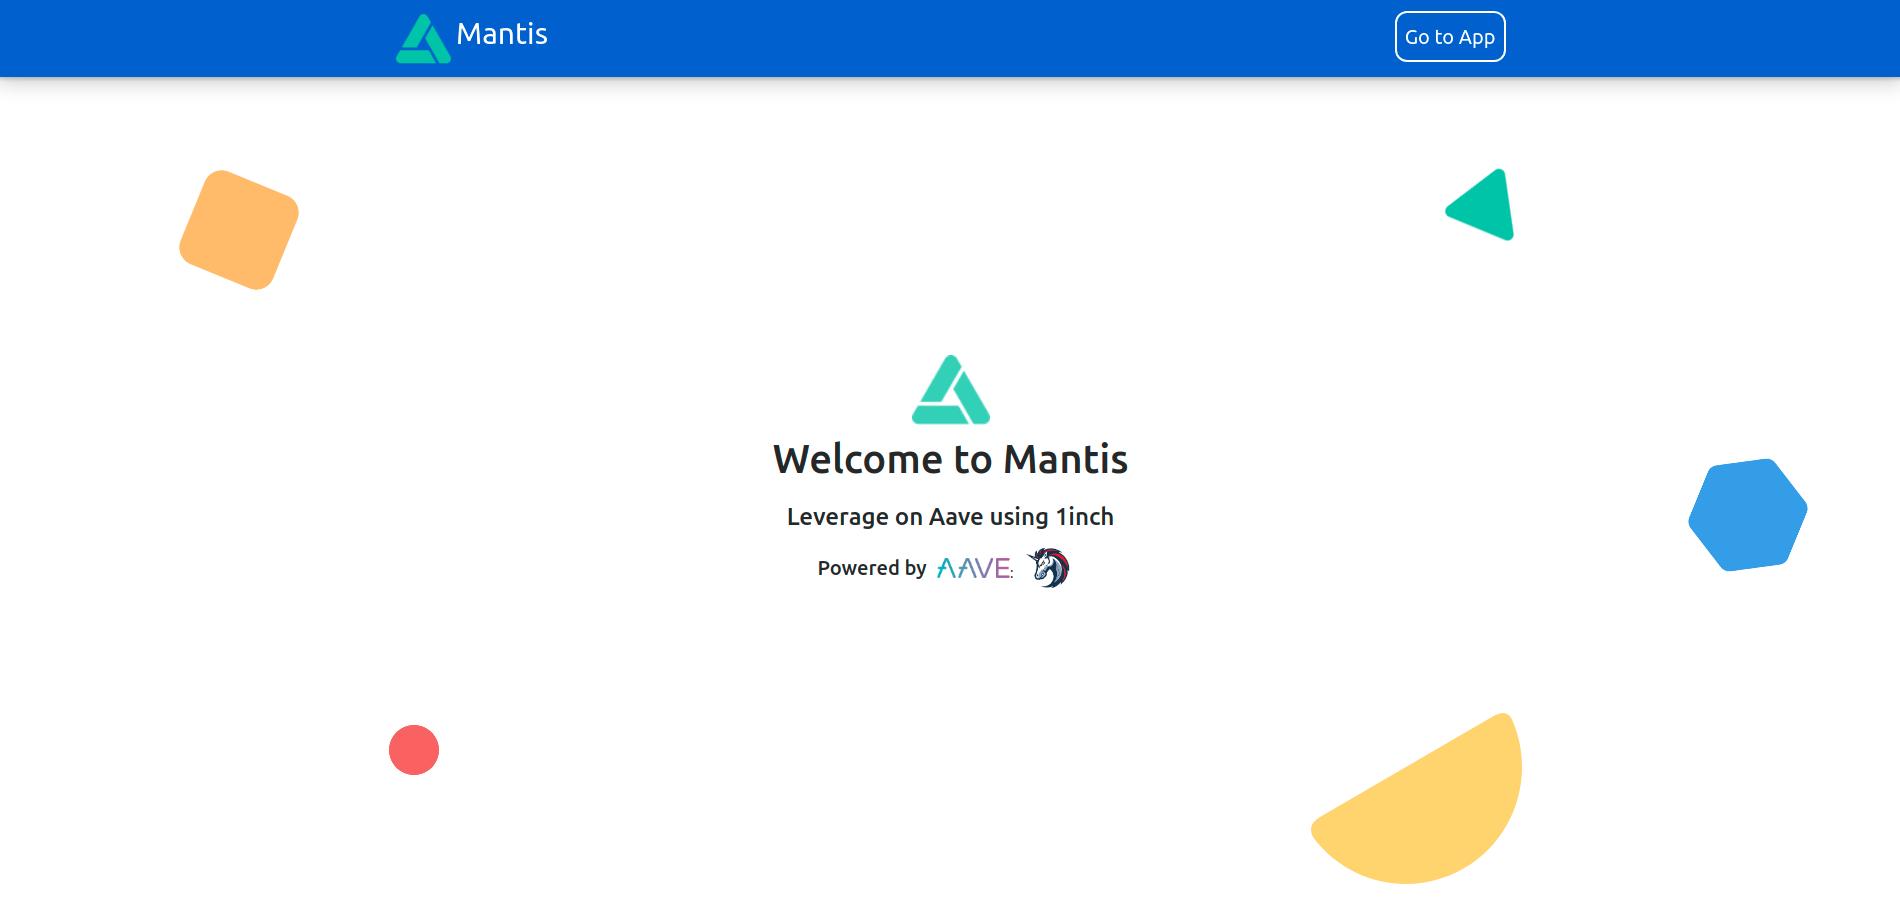 Mantis showcase